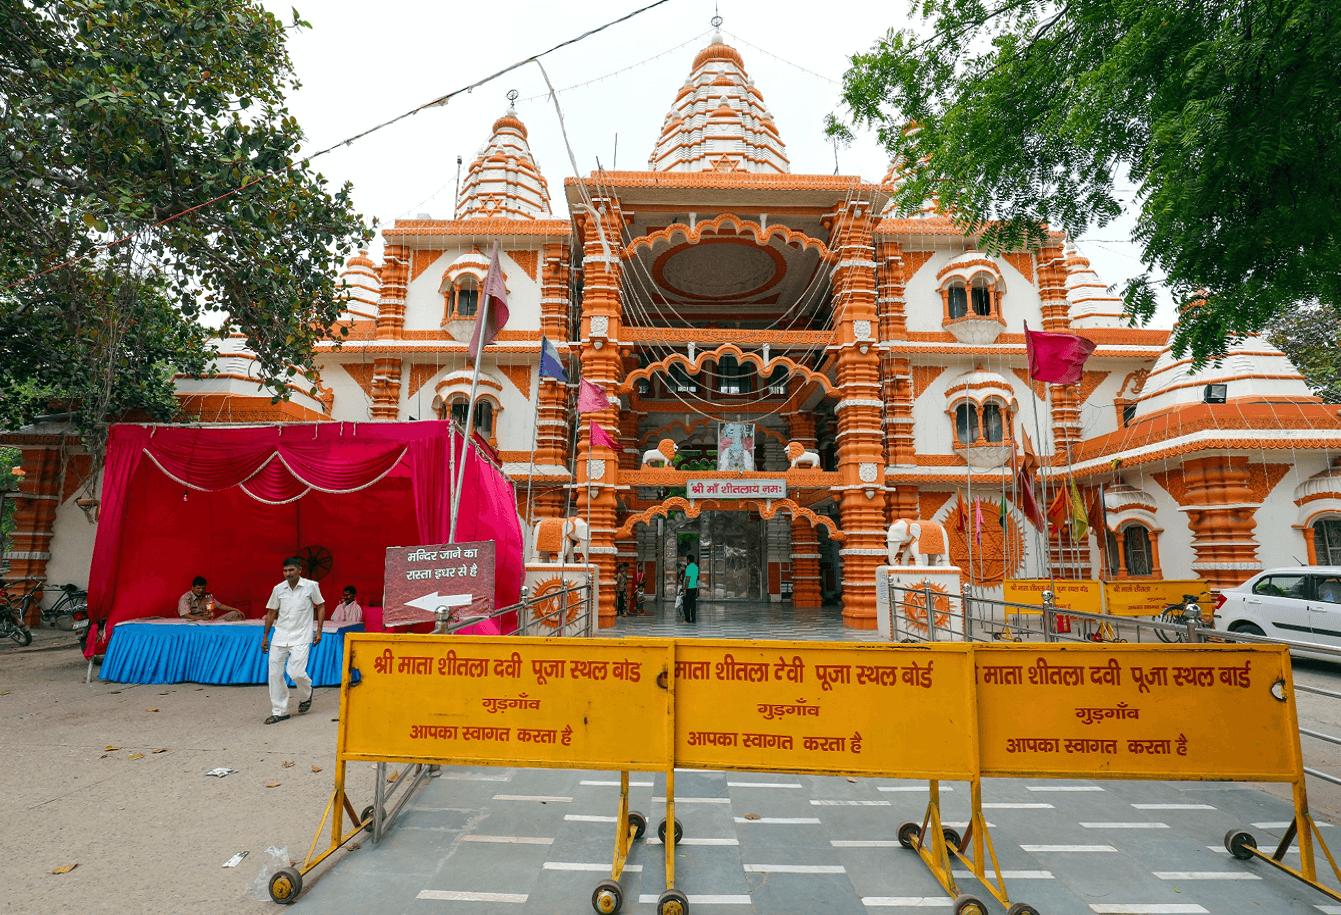 Shri Sheetala Mata Mandir, Gurugram